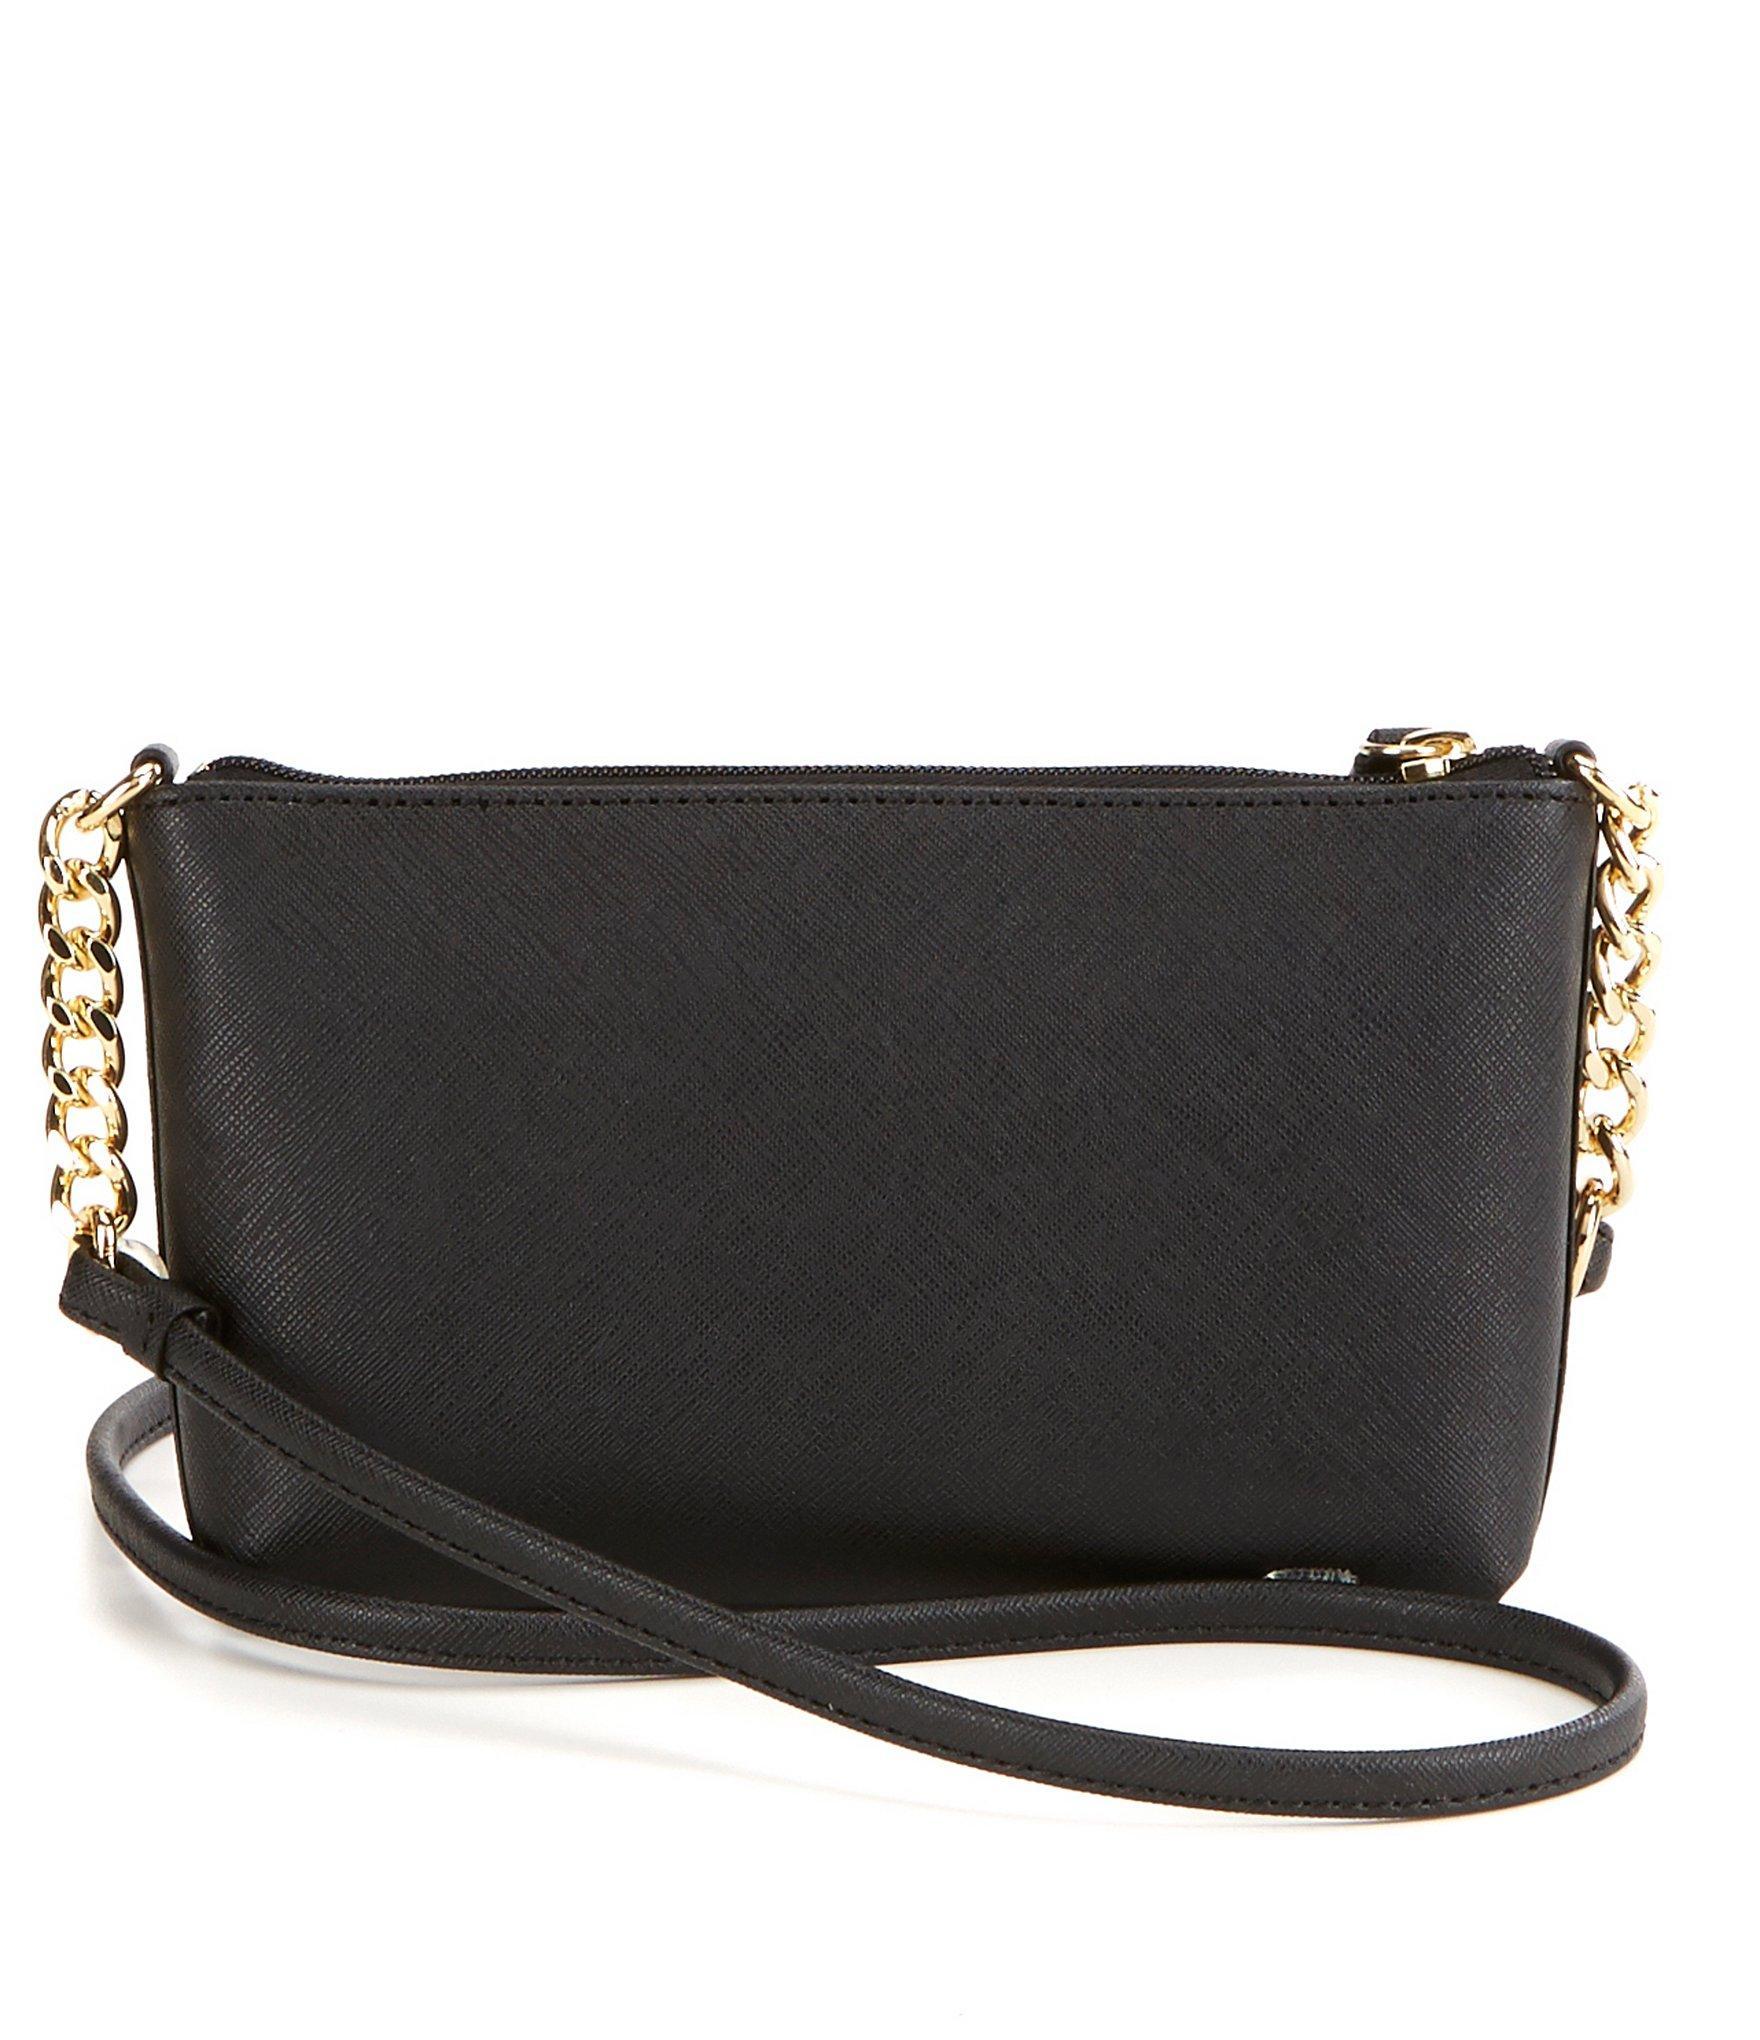 Lyst - Calvin Klein Floral Saffiano Cross-body Bag In Black